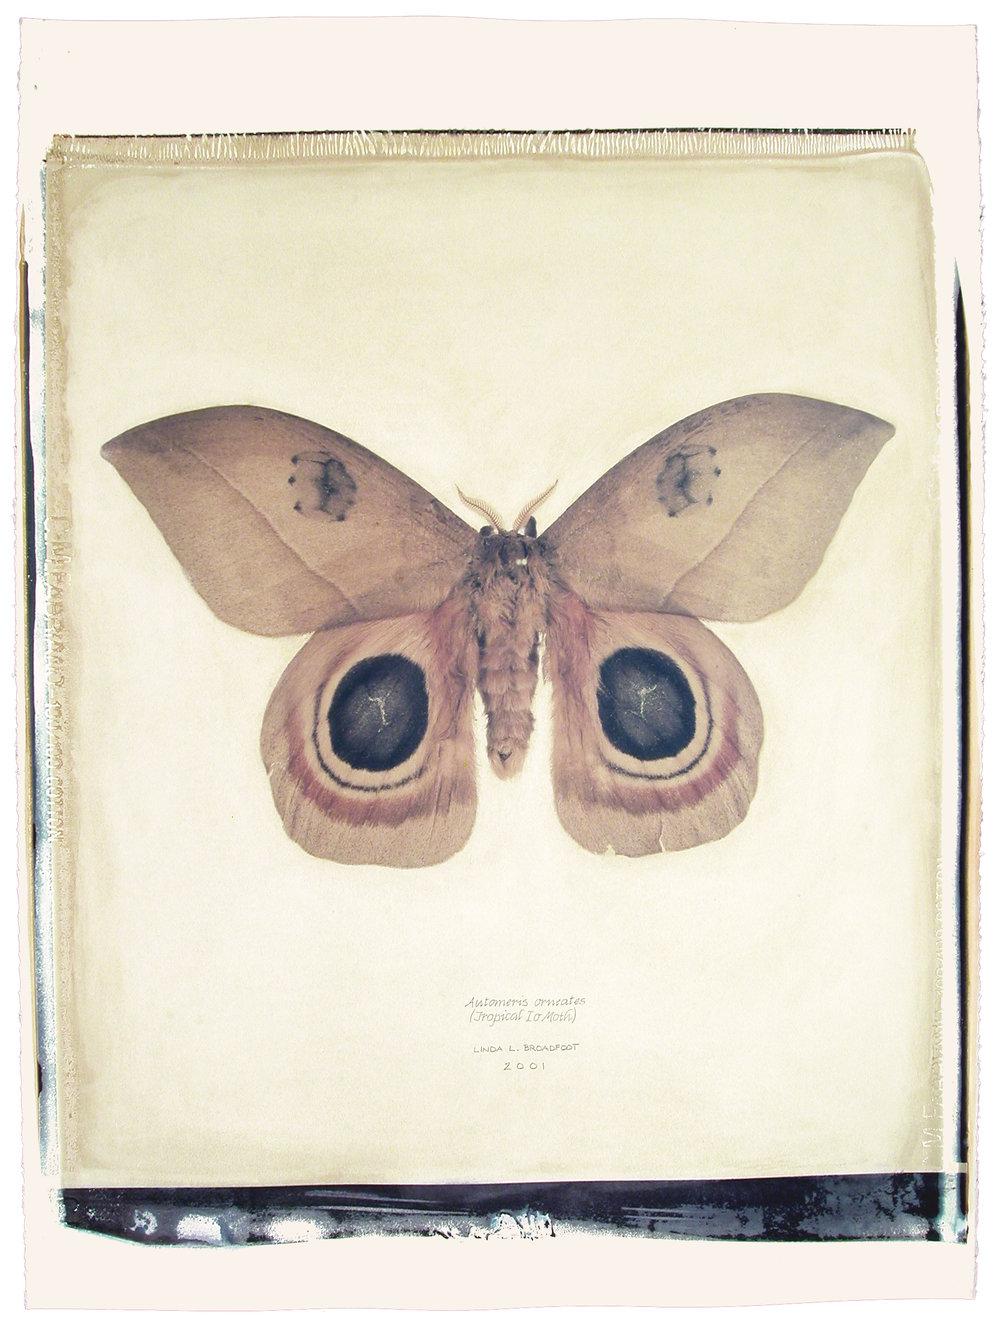 Automeris orneates  (Tropical Io Moth), 2001